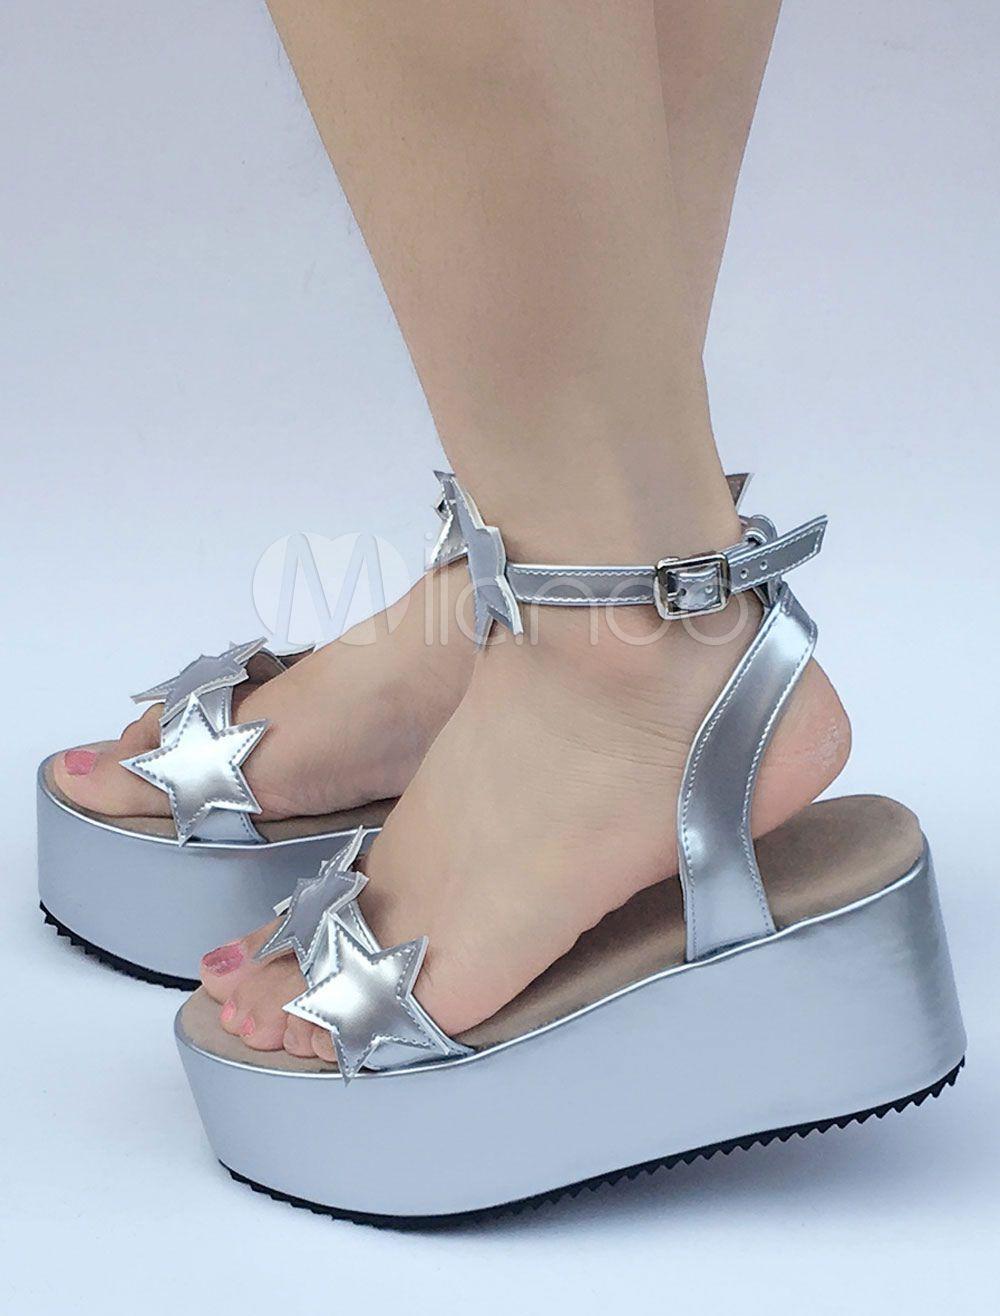 6b8eec02e0c2 Sweet Lolita Shoes Silver Stars Platform Wedge Lolita Sandals  Shoes ...